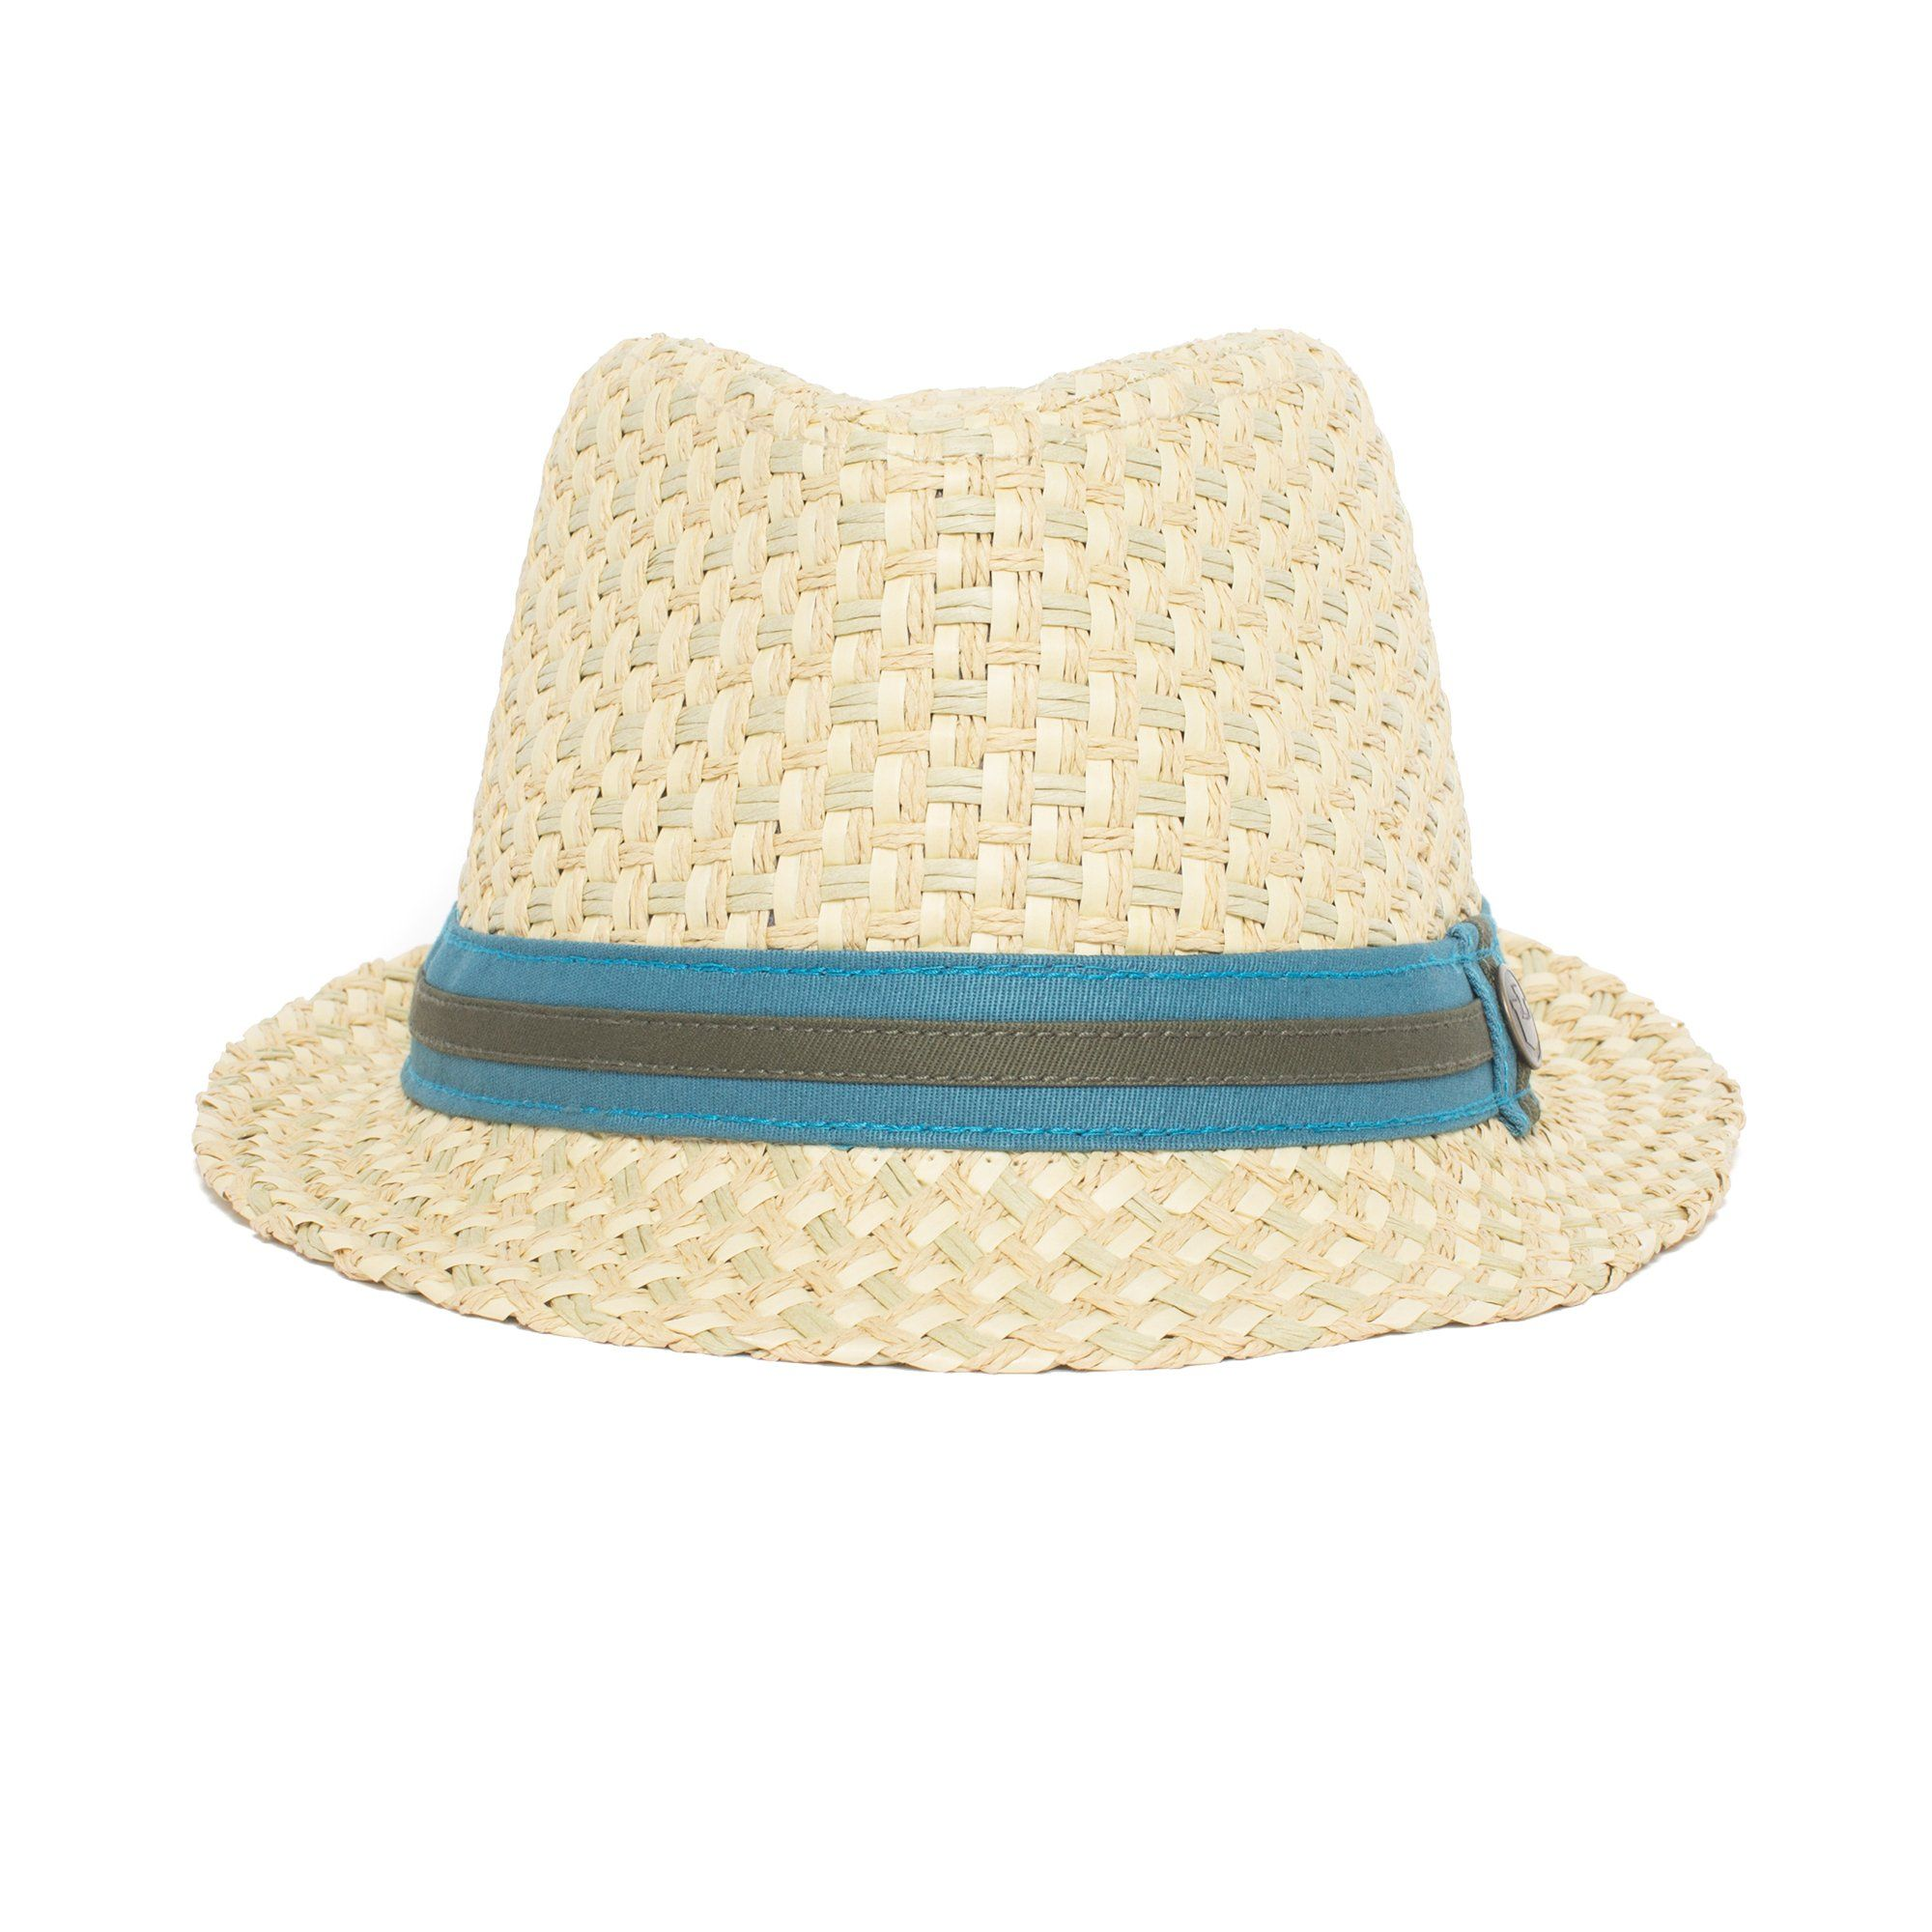 Goorin Malibu Fedora Hat in Natural, size Medium